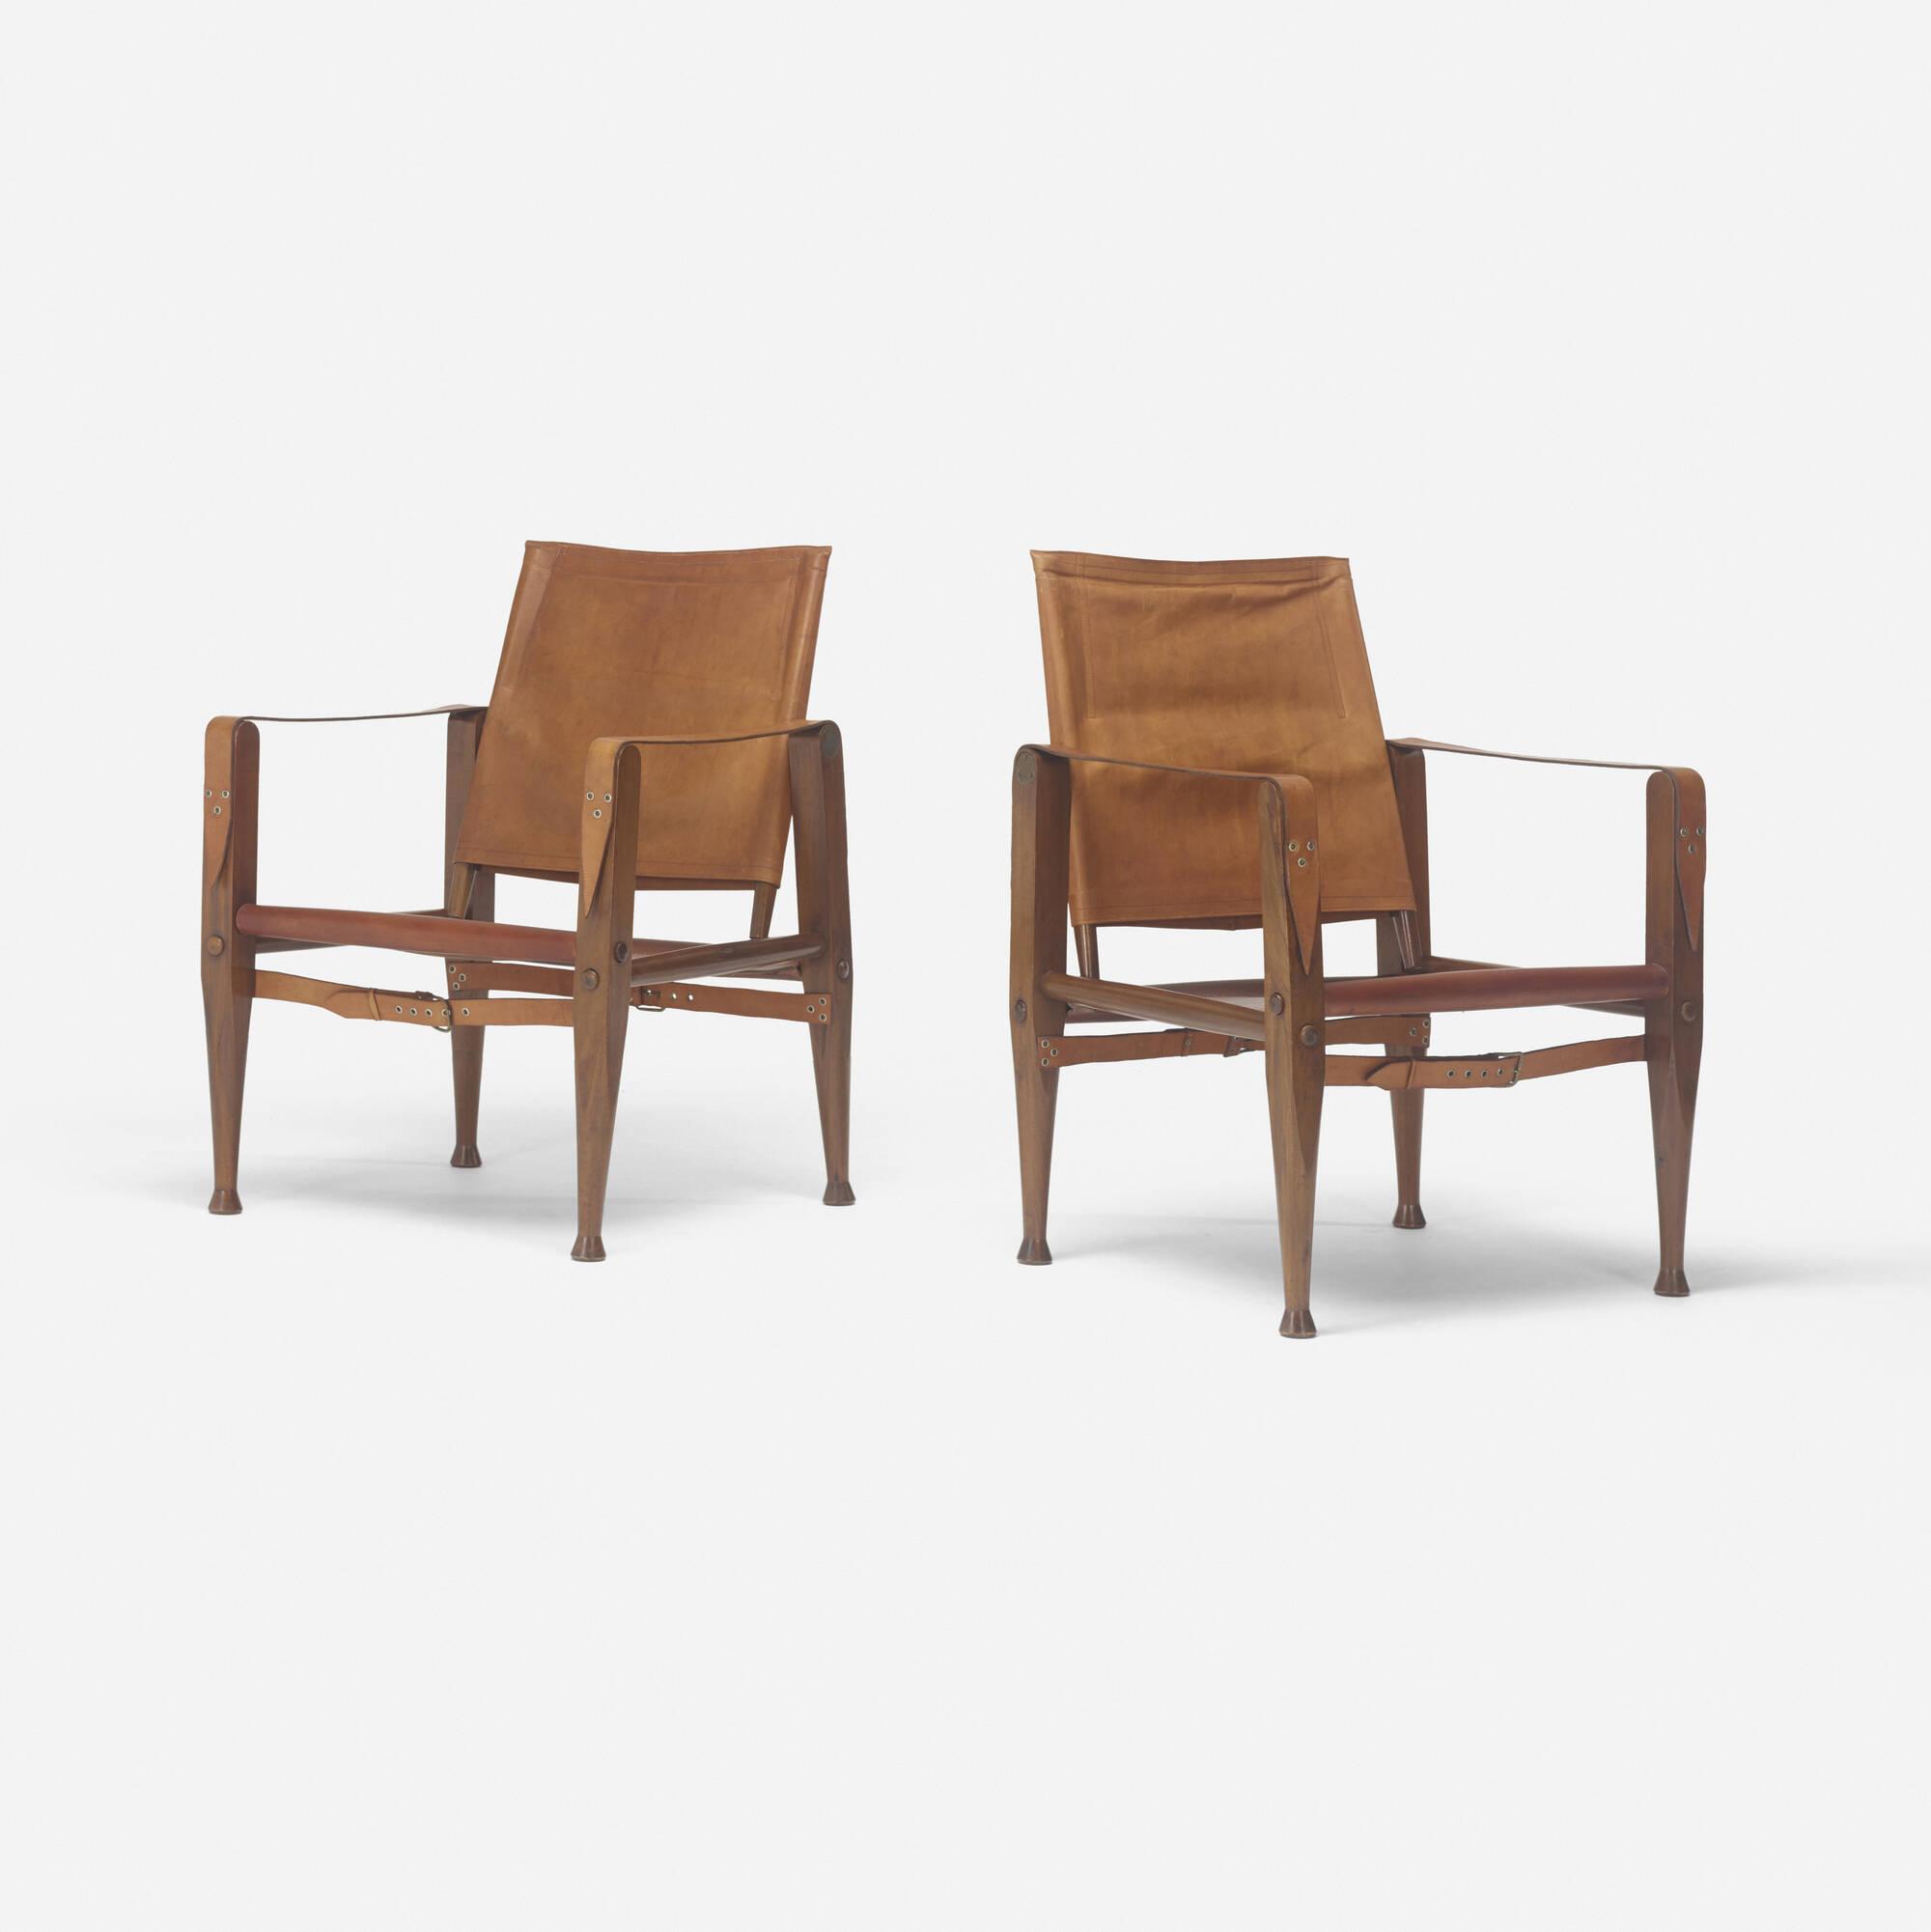 123: Kaare Klint / Safari chairs, pair (2 of 3)